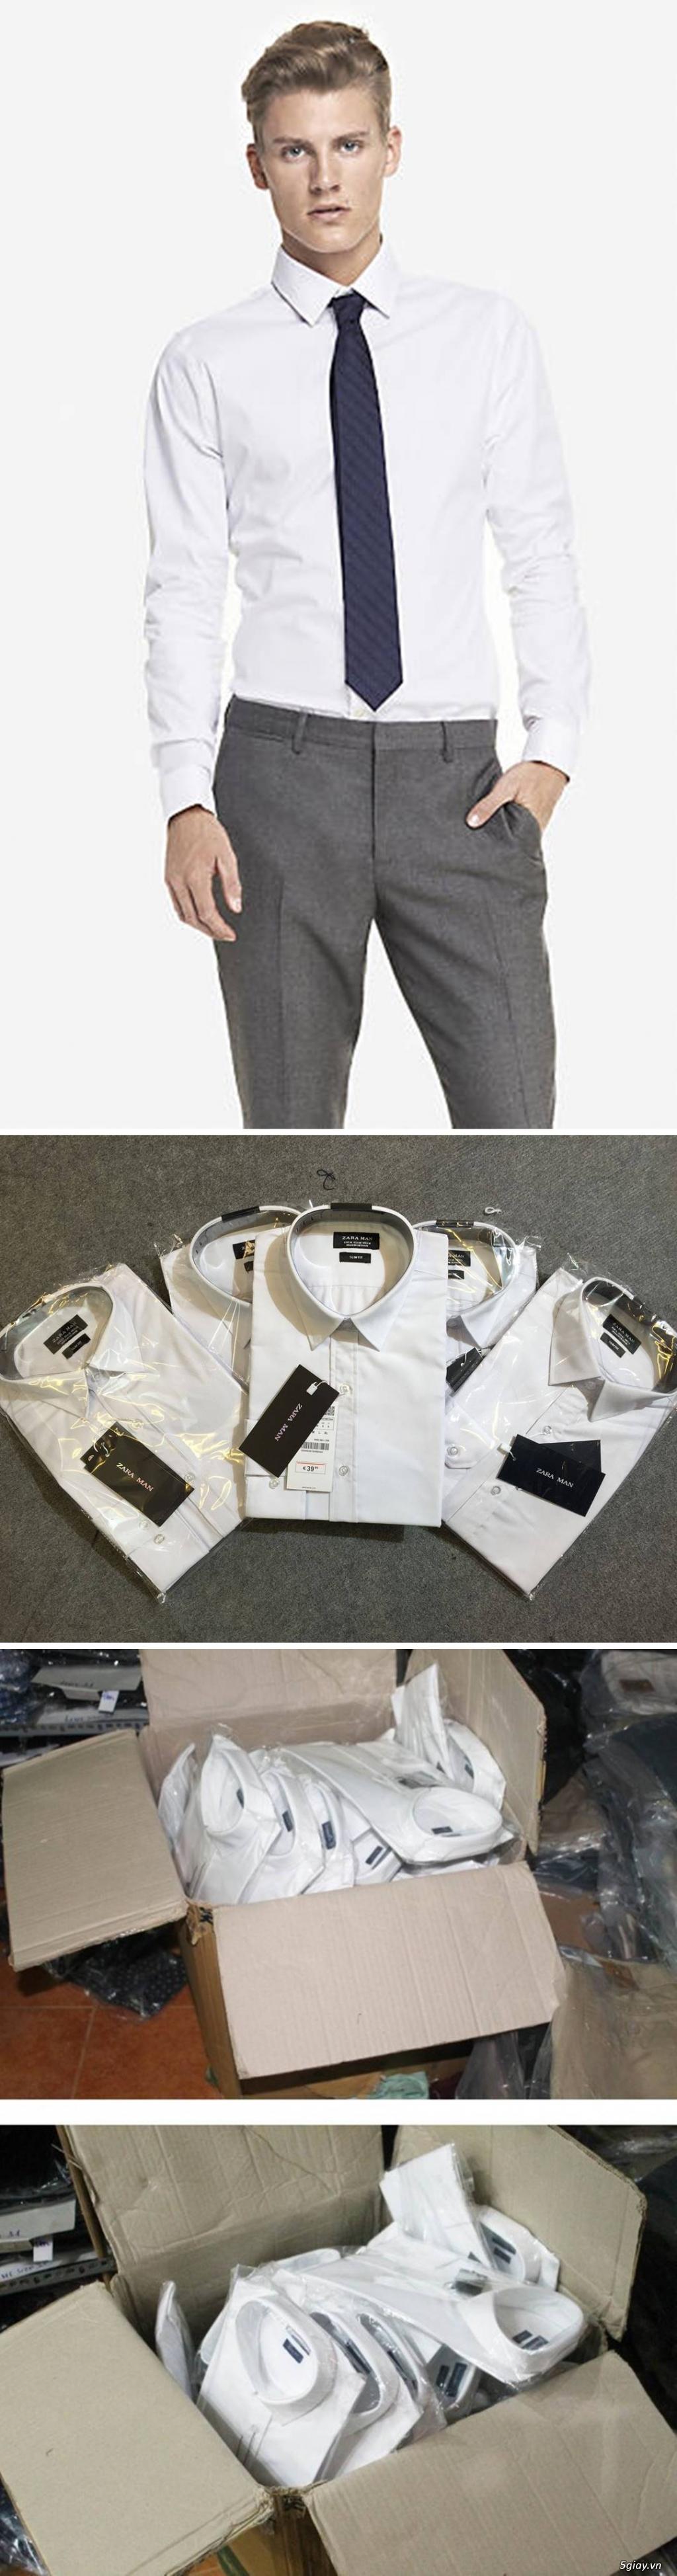 Shop285.com - Shop quần áo : Zara,Jules,Jake*s,,Hollister,Aber,CK,Tommy,Levis - 43